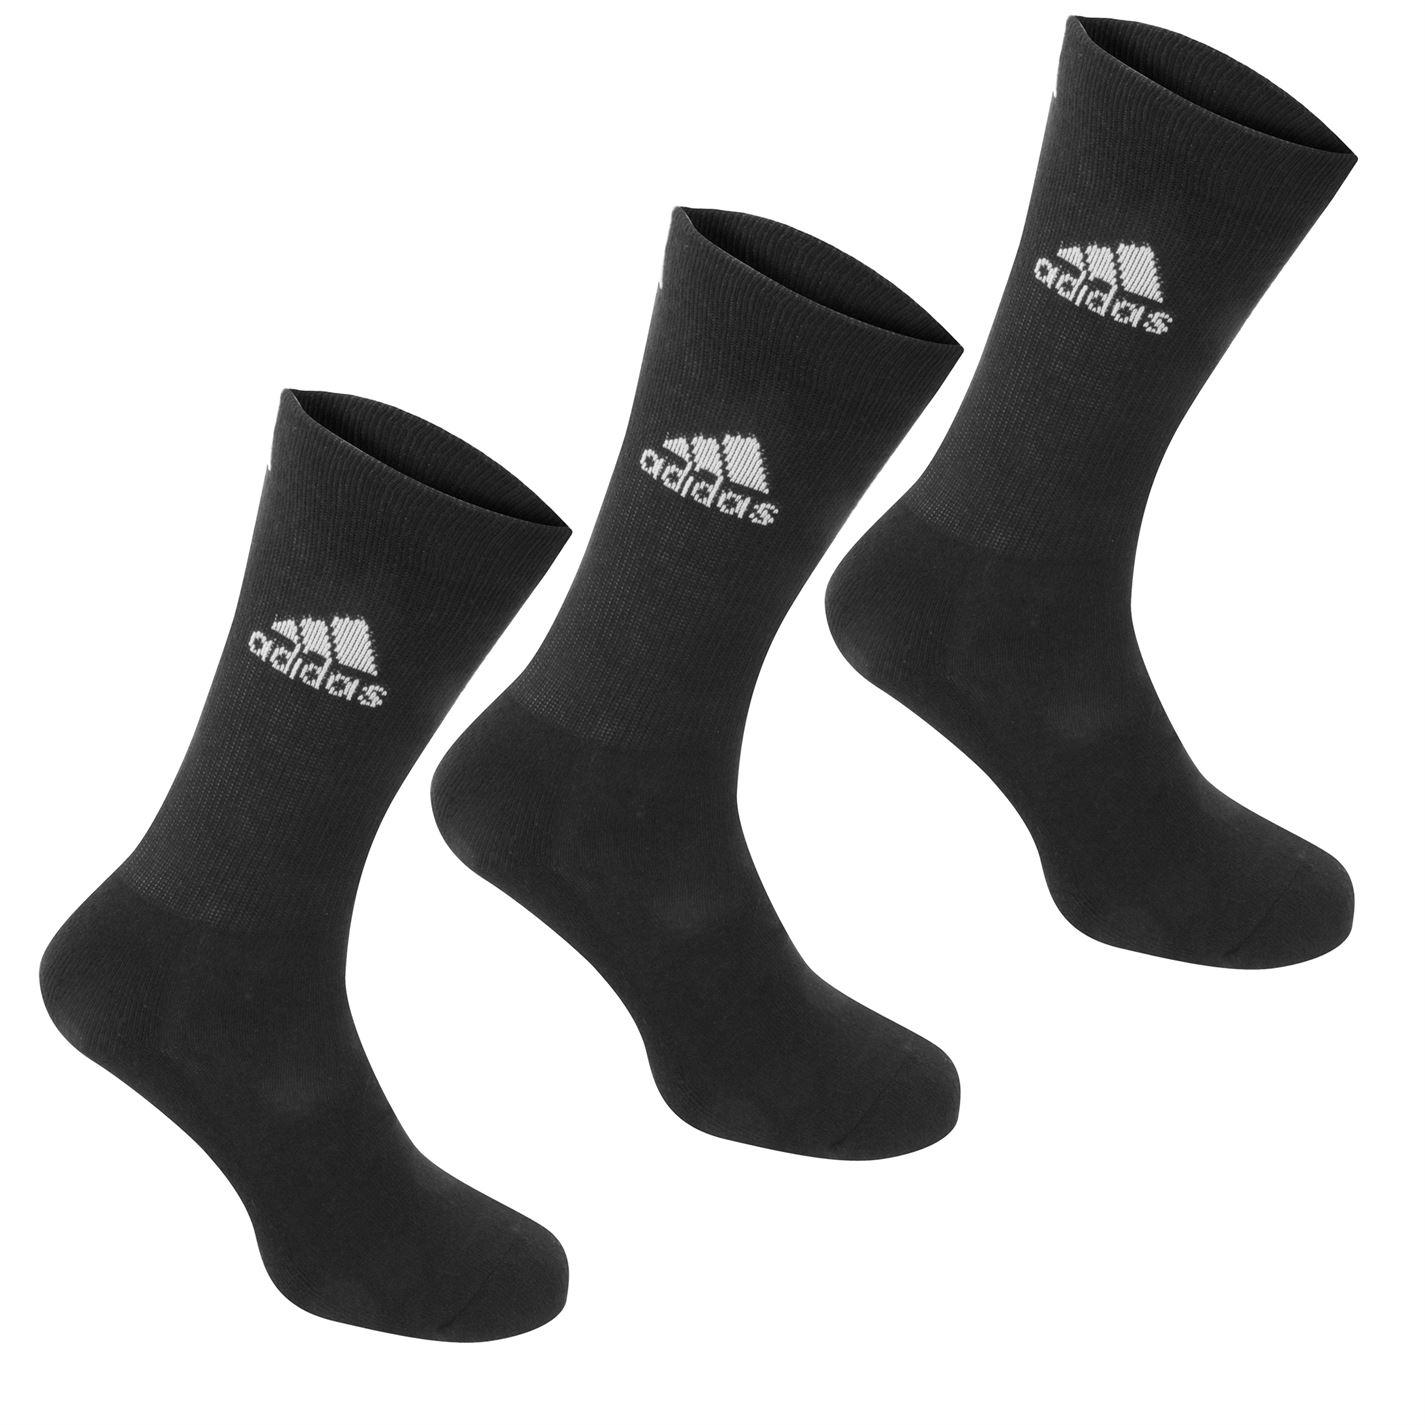 Adidas Golf Crew Socks Mens